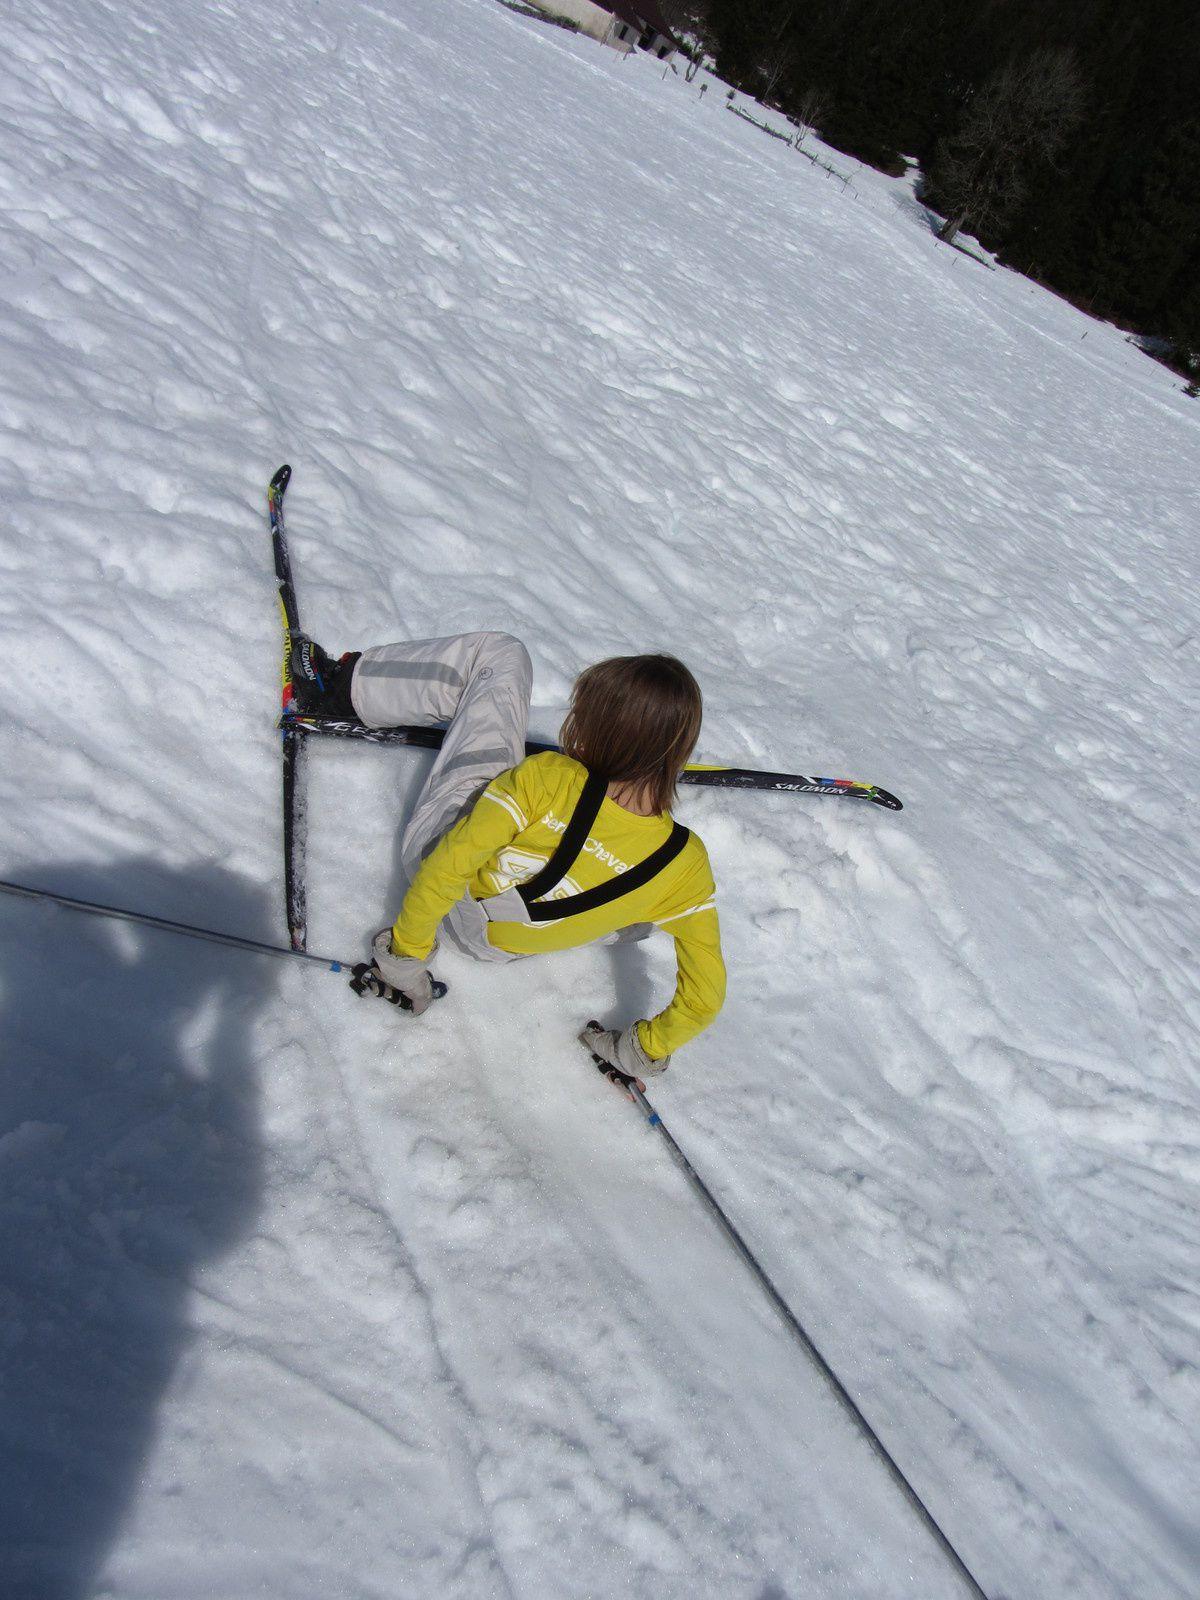 Les sorties &quot&#x3B;ski de fond&quot&#x3B; : avant, pendant, après... la gamelle!